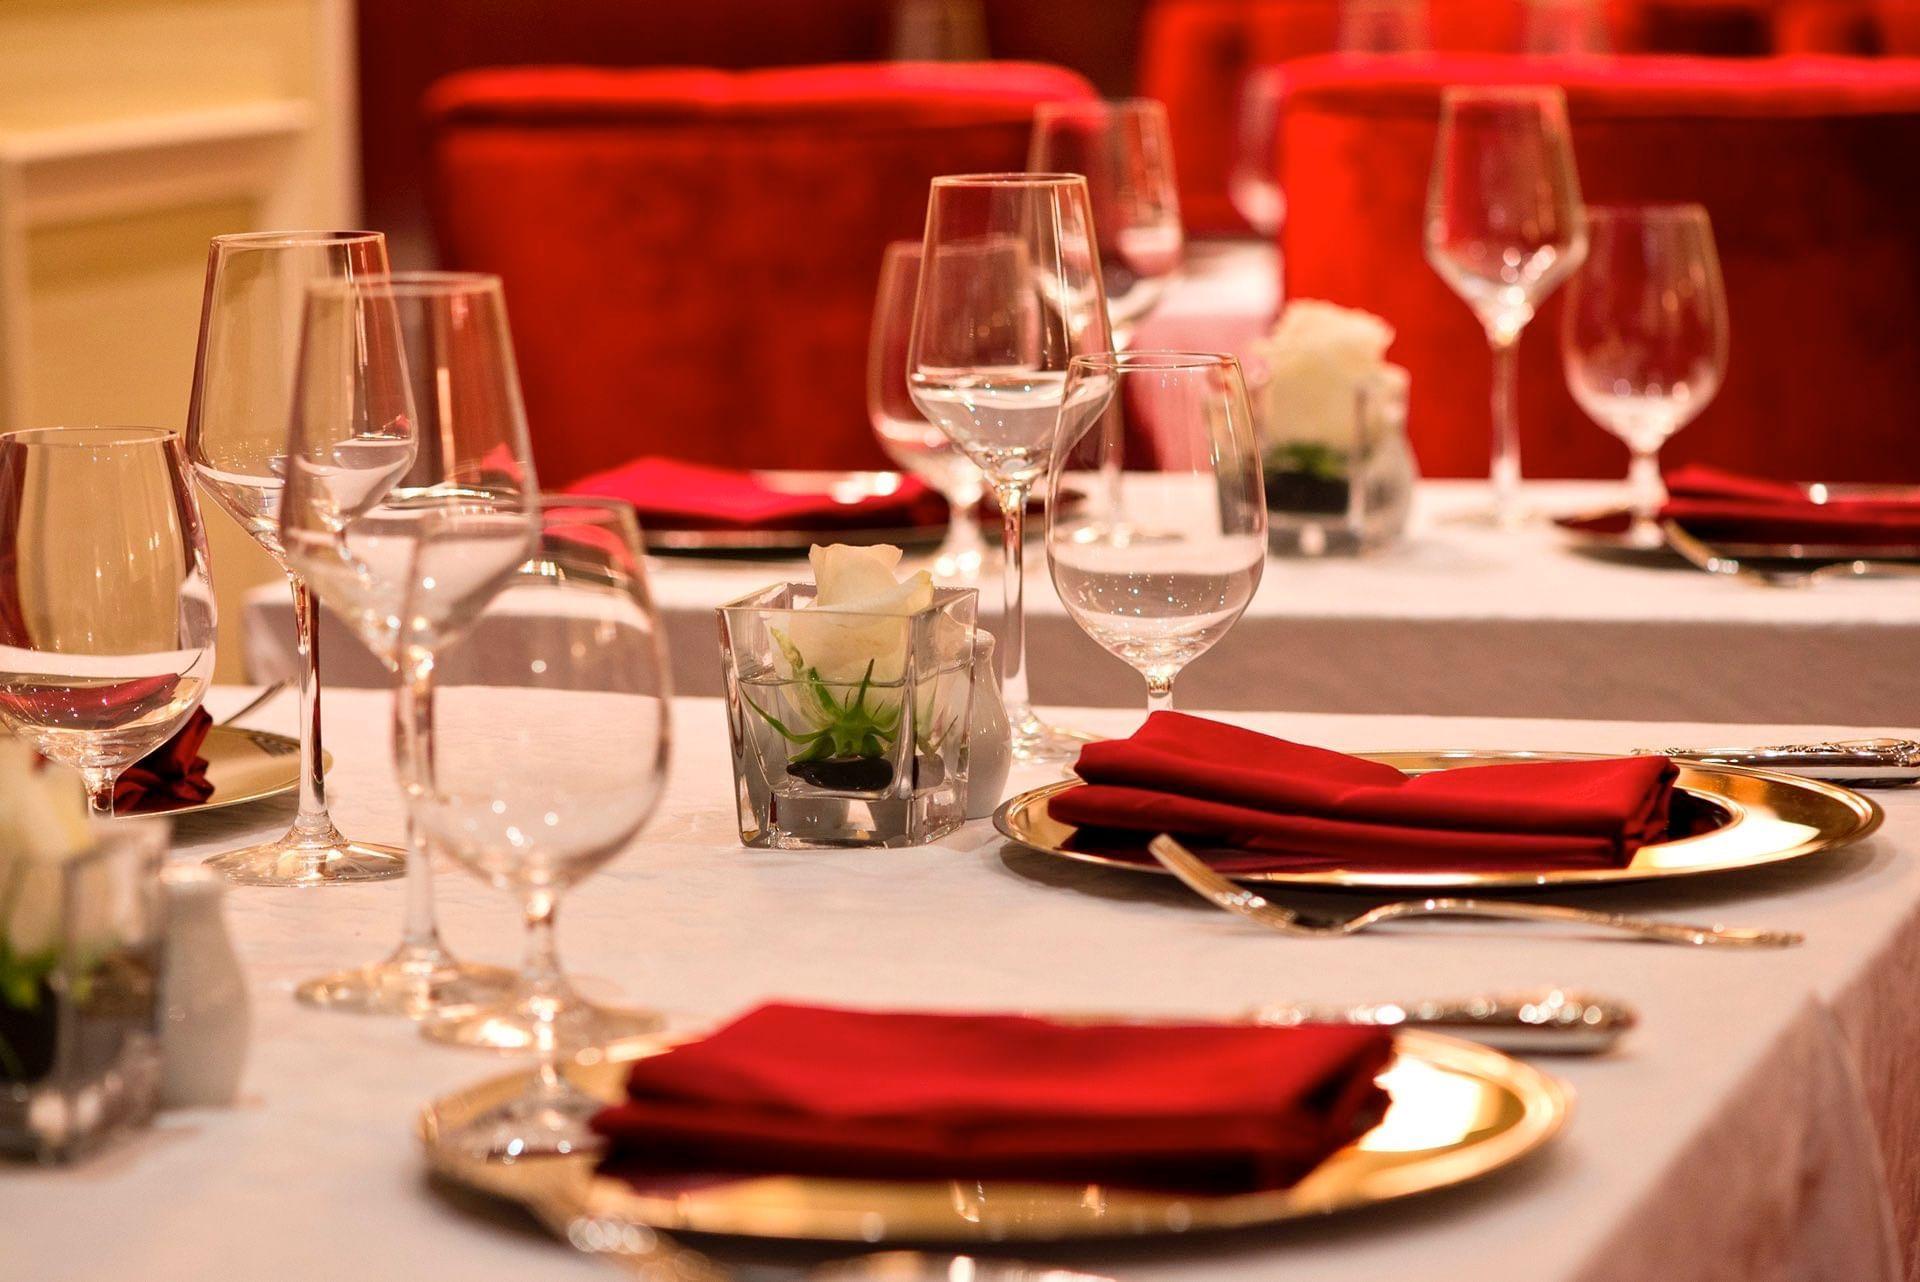 Carisma Restaurant Close-up Table Set-Up